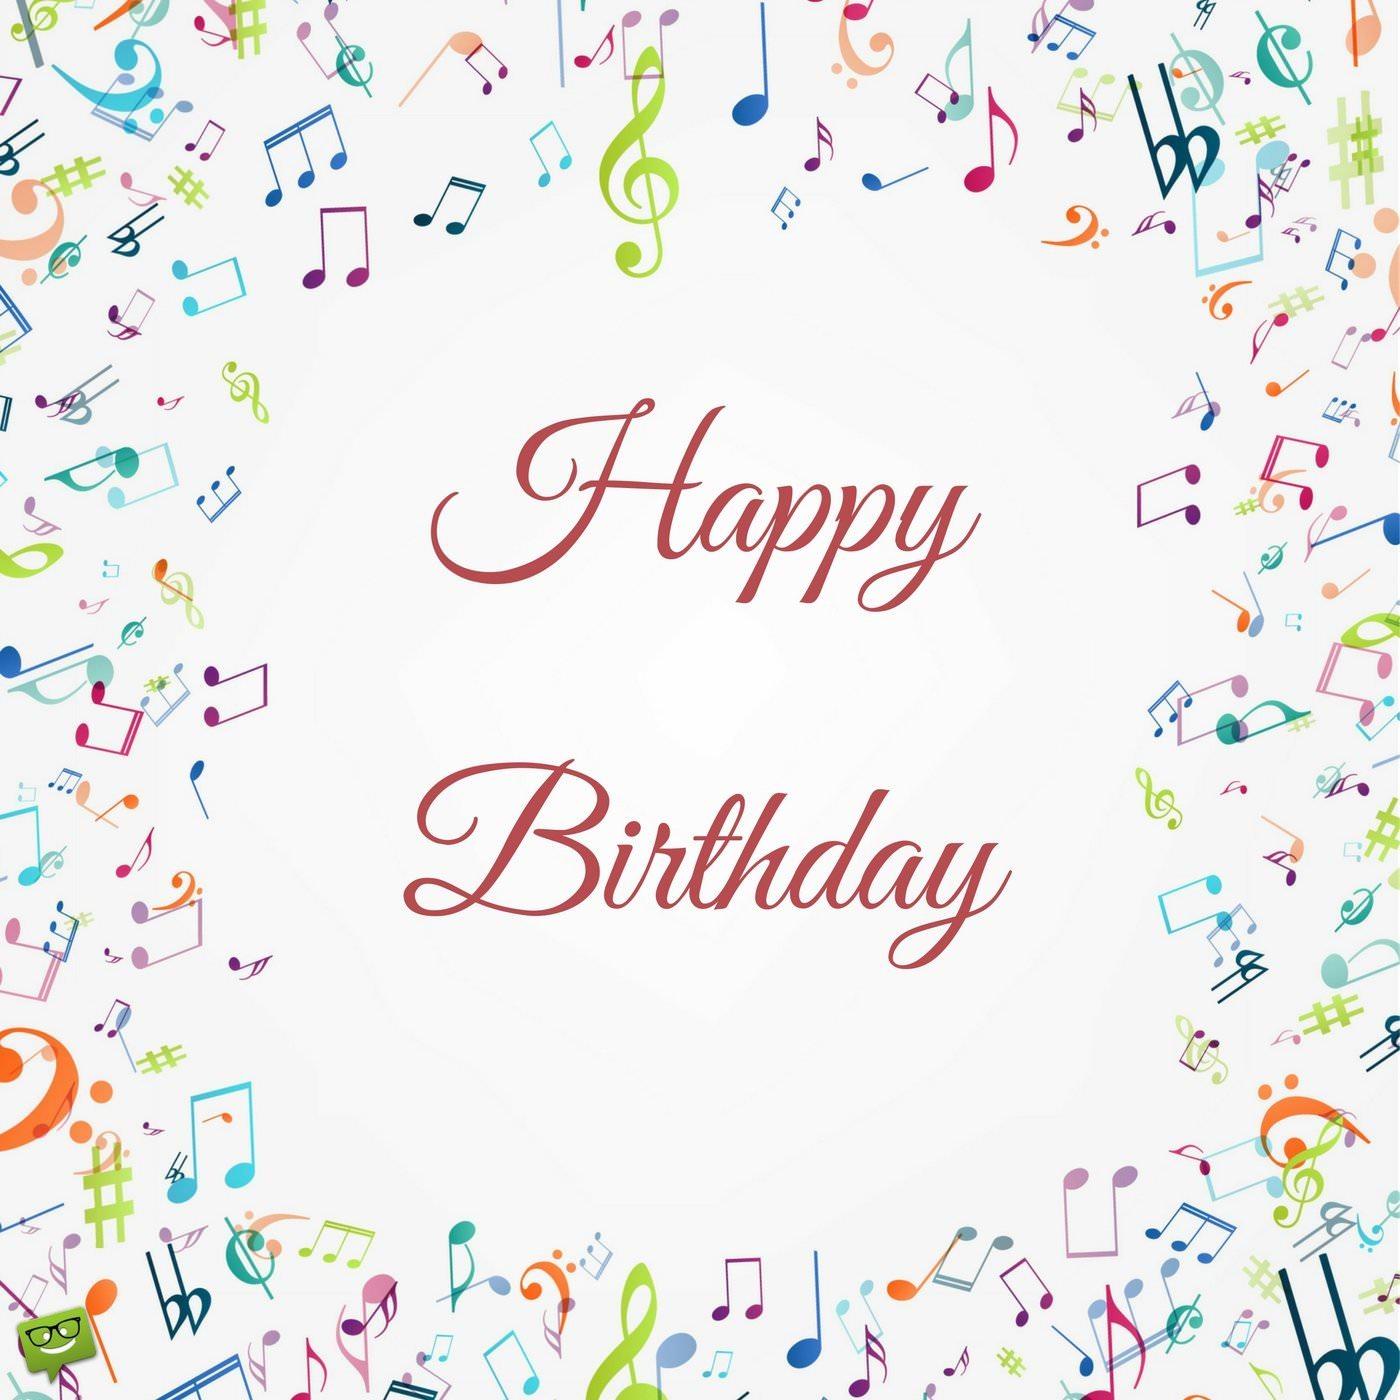 Happy Birthday To Our C.E.O